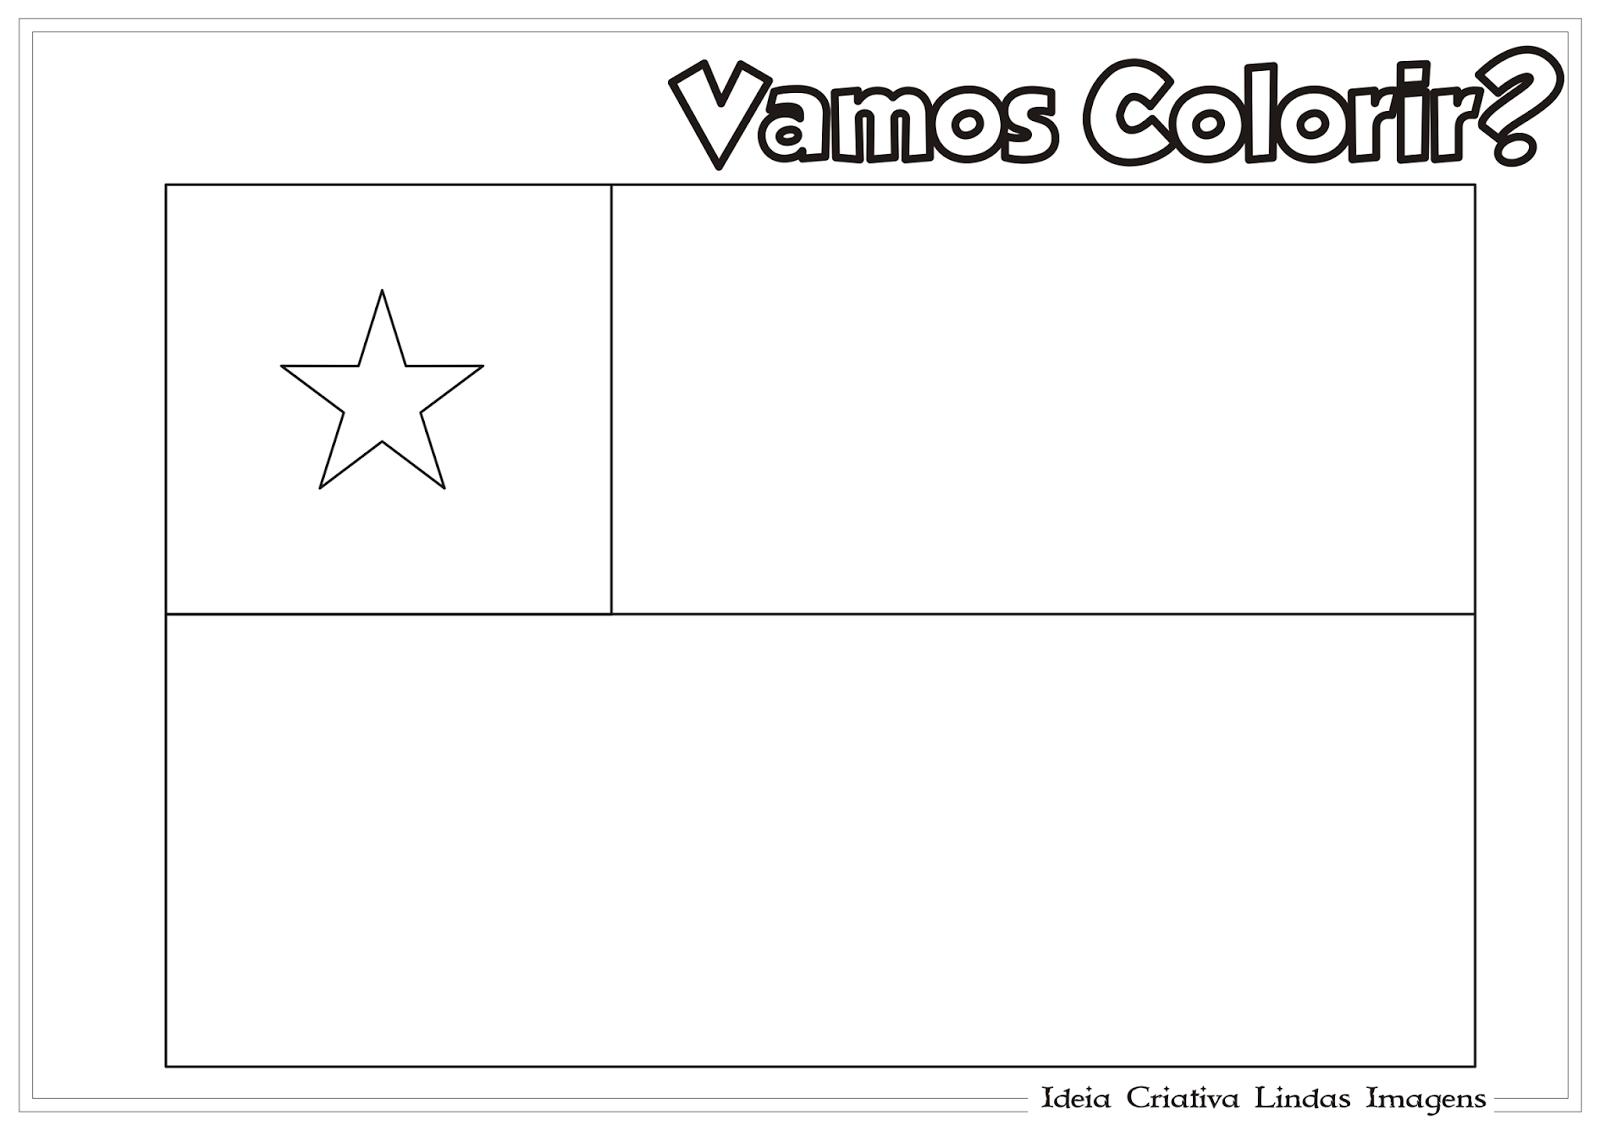 Copa do Mundo 2014 - Grupo B: Bandeira da Chile pra colorir